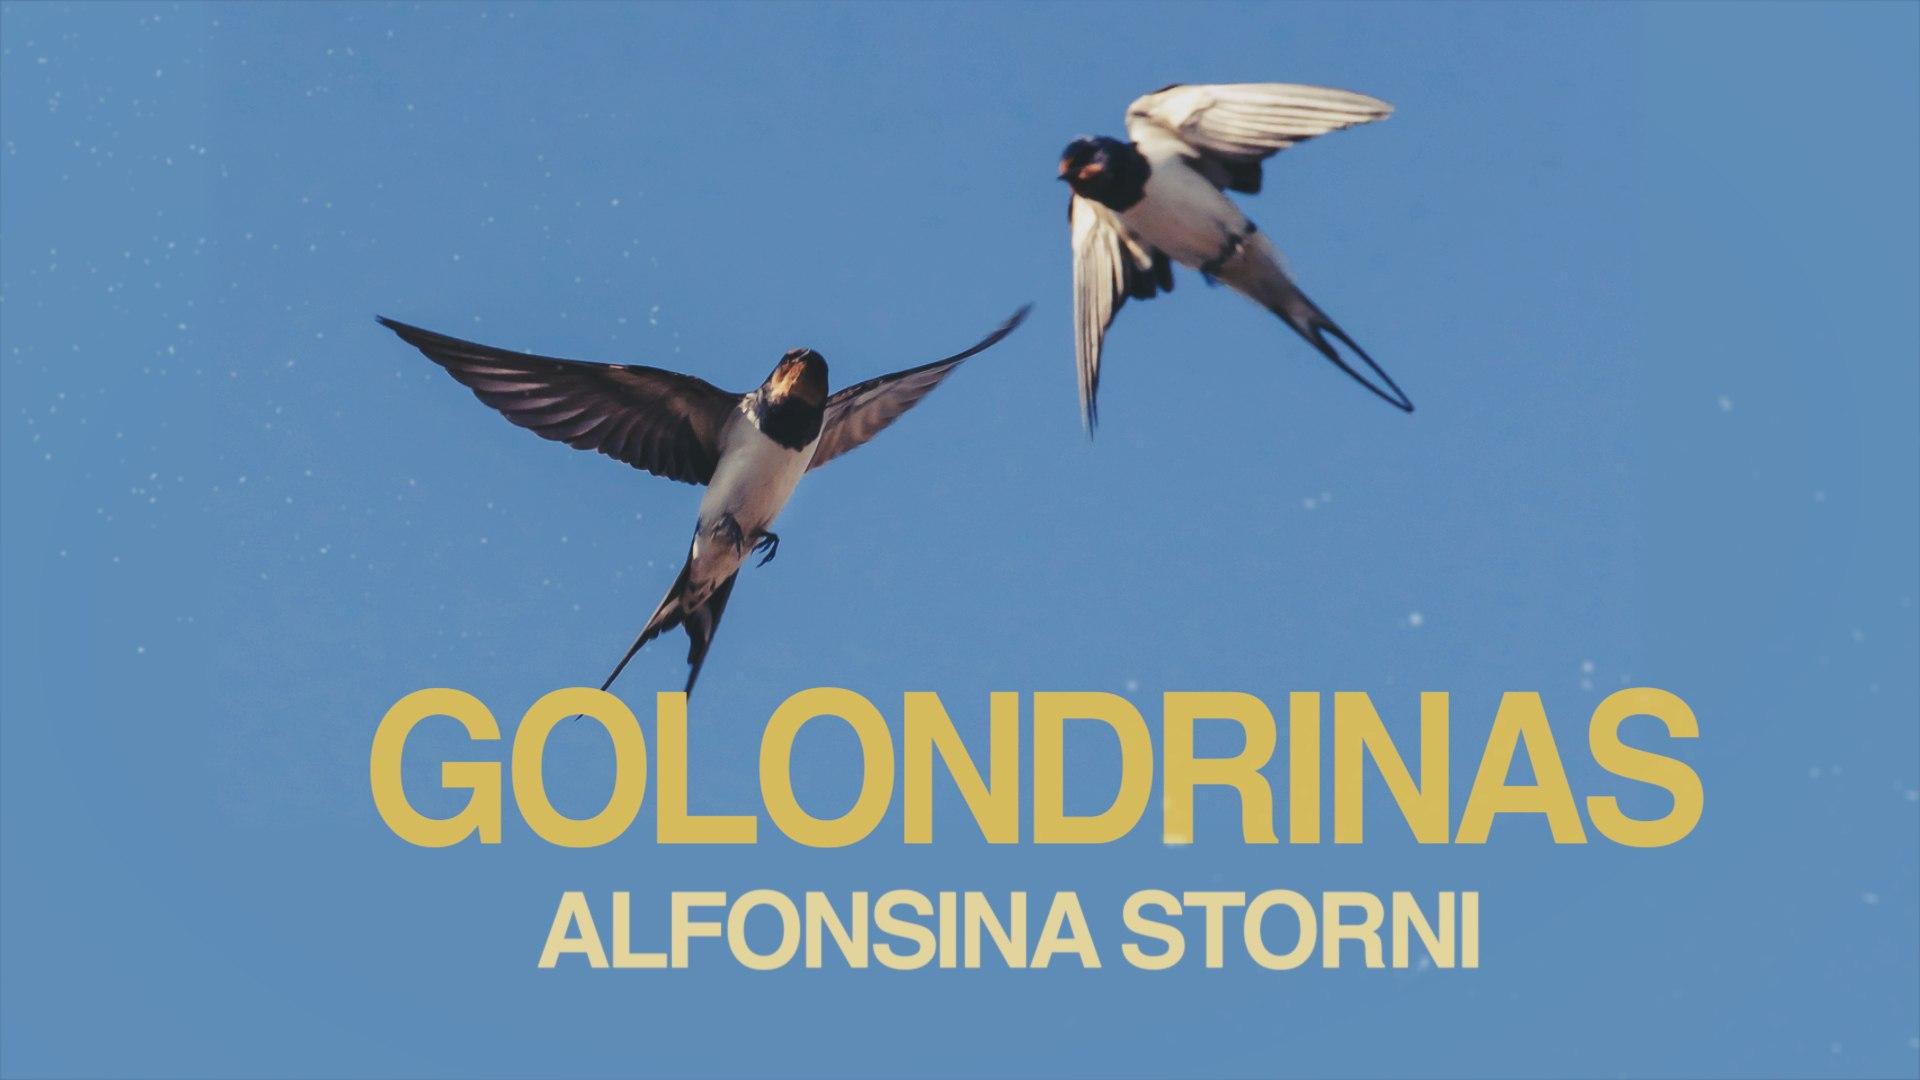 Golondrinas Alfonsina Storni